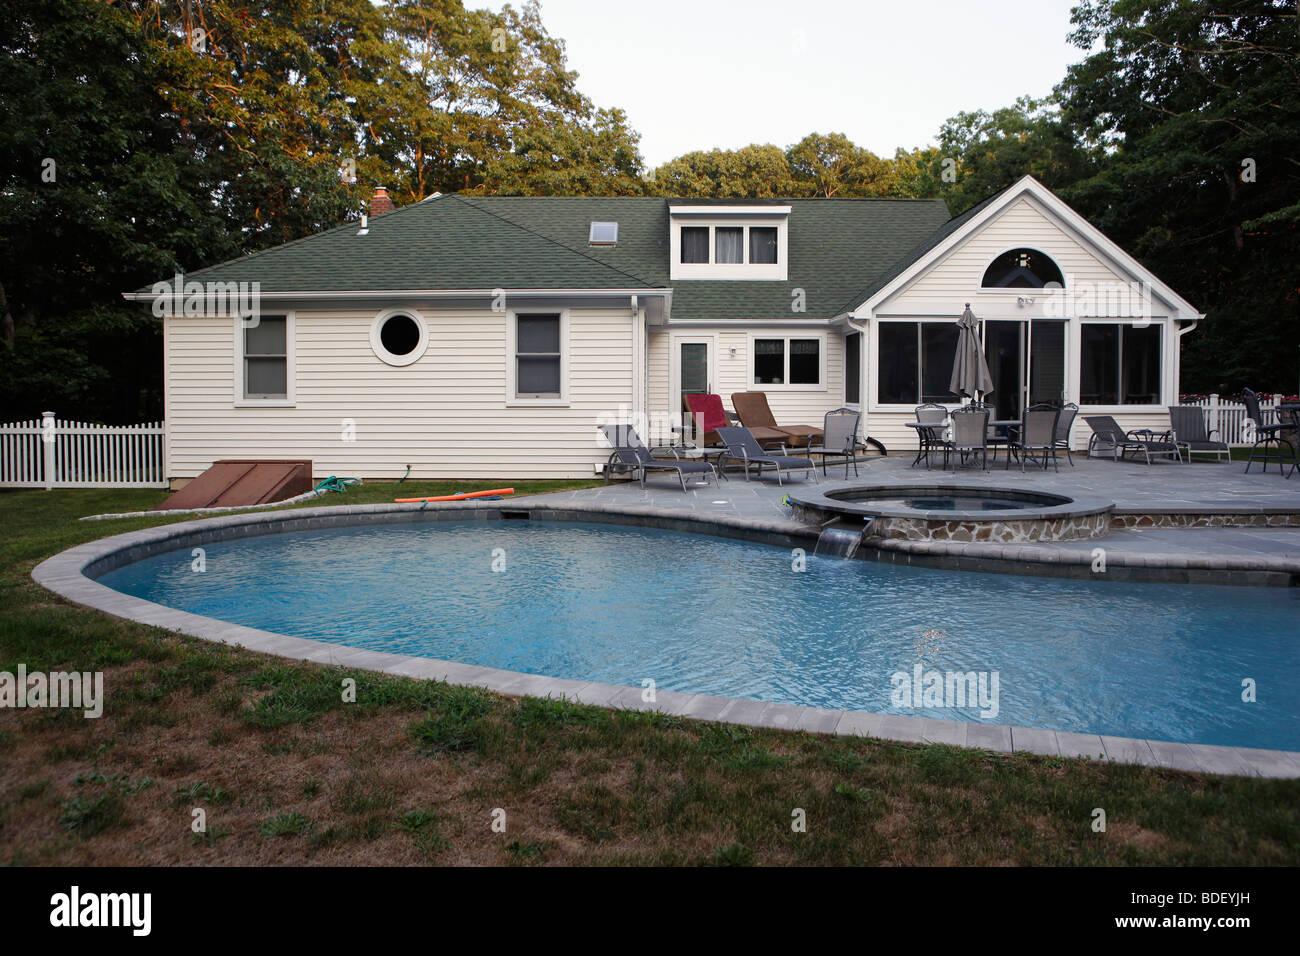 Backyard pool, summer house, Sag Harbor, New York - Stock Image